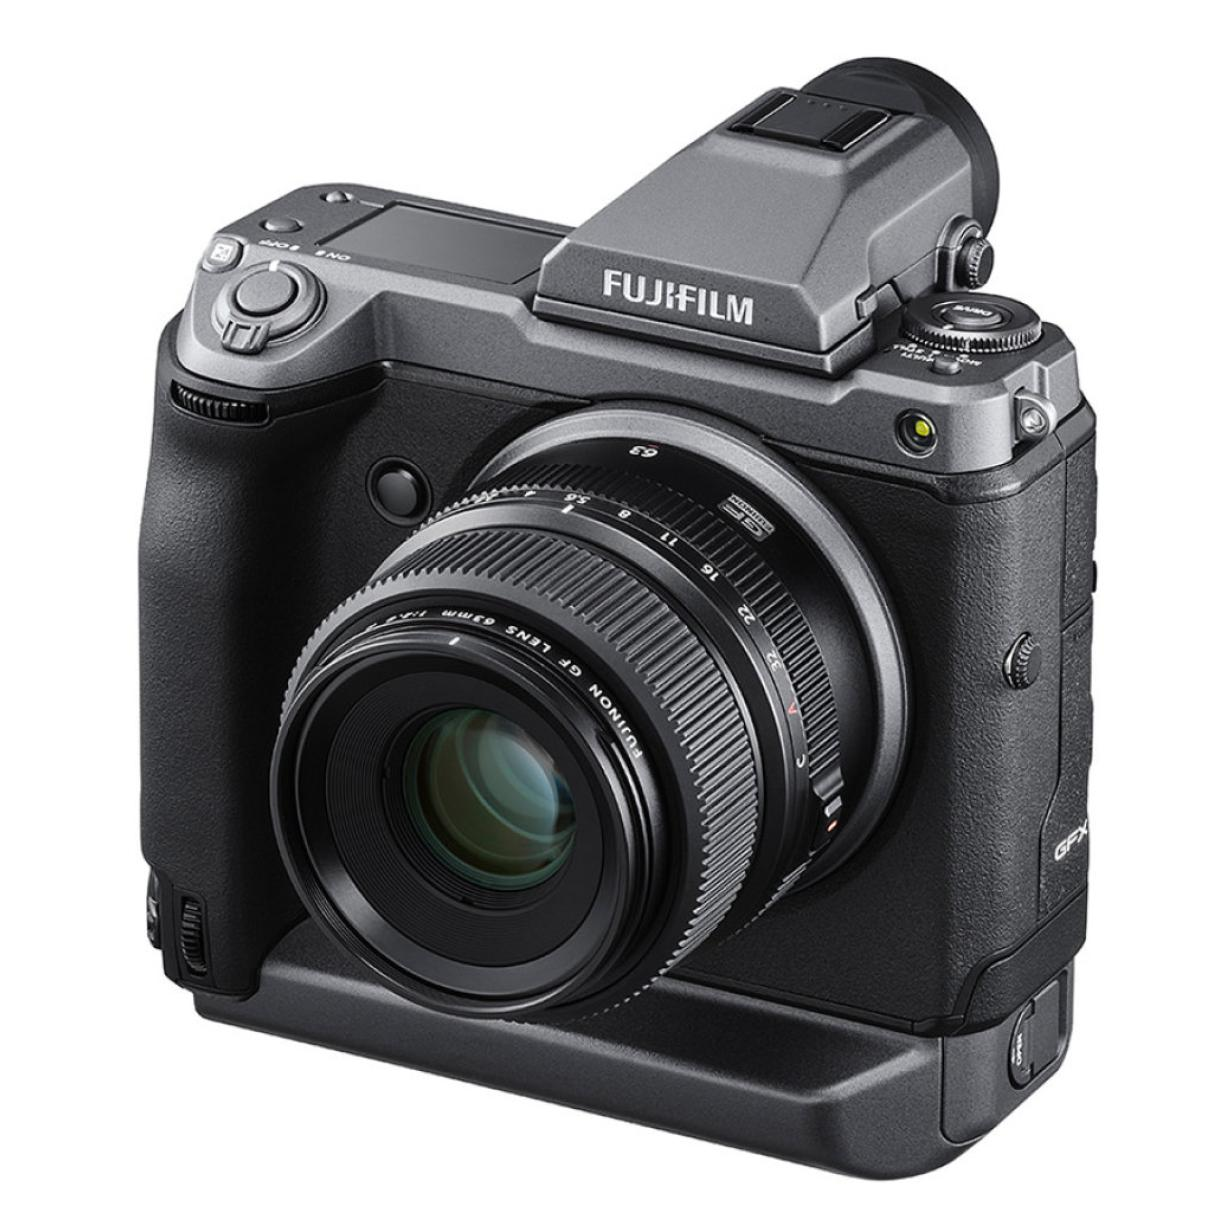 Fujifilm startet mit 11.000-Euro-Systemkamera GFX100